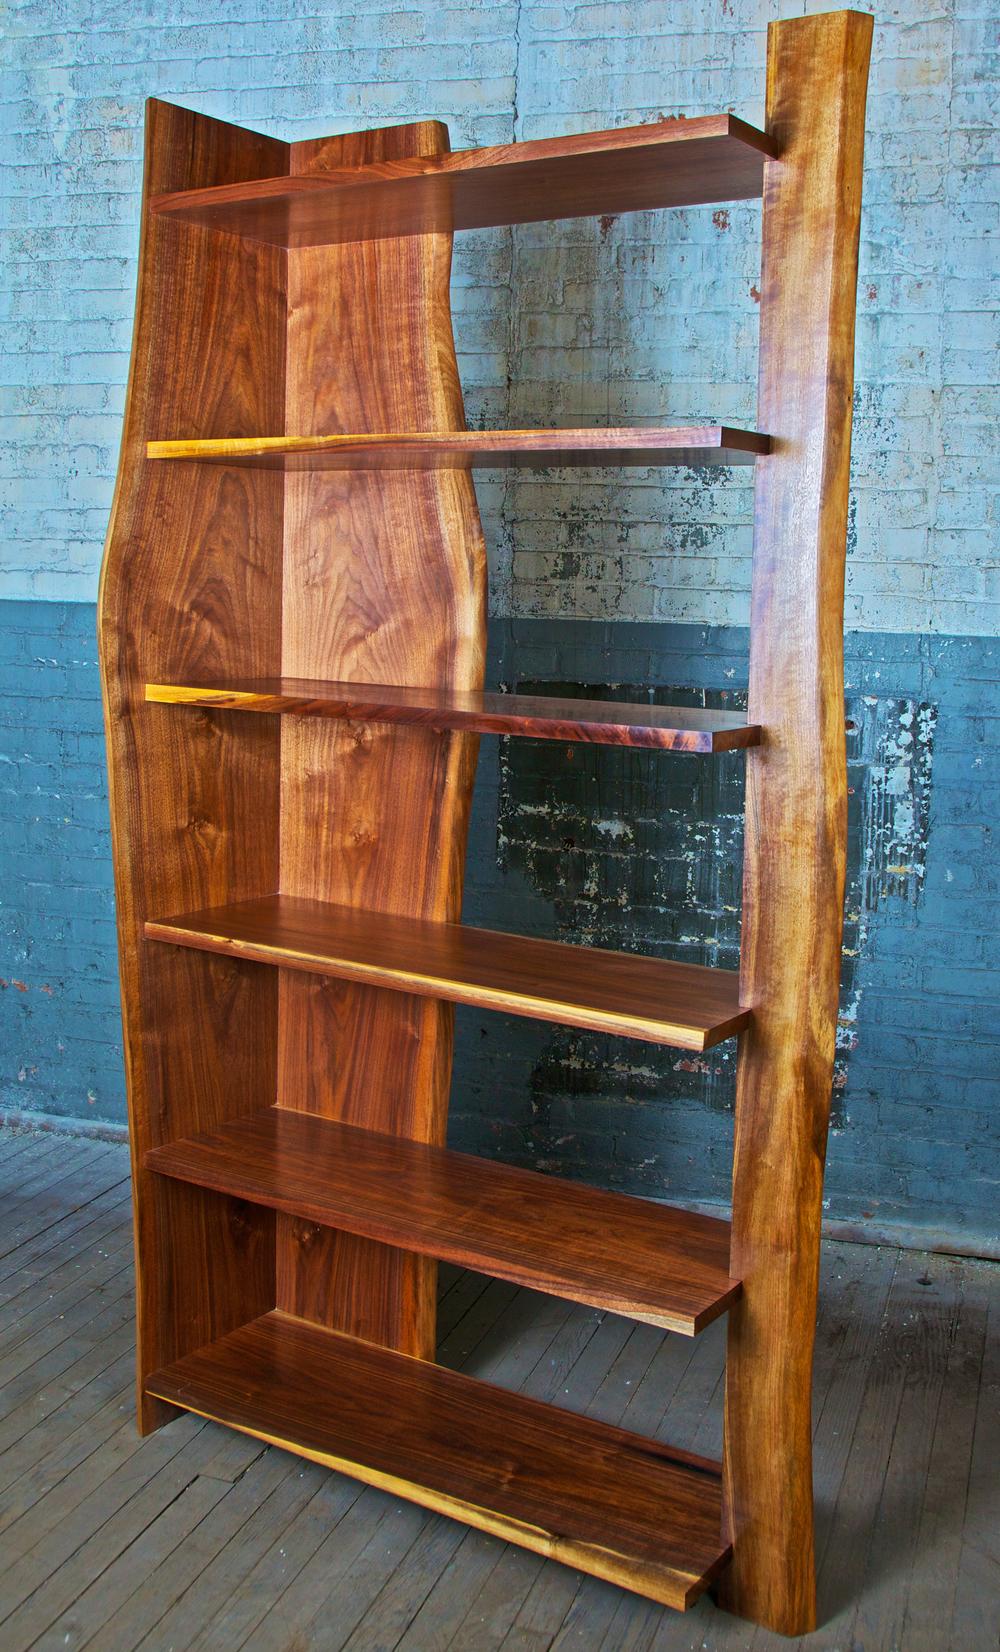 Bookcase 2012-04-30 11-43-471769.jpg